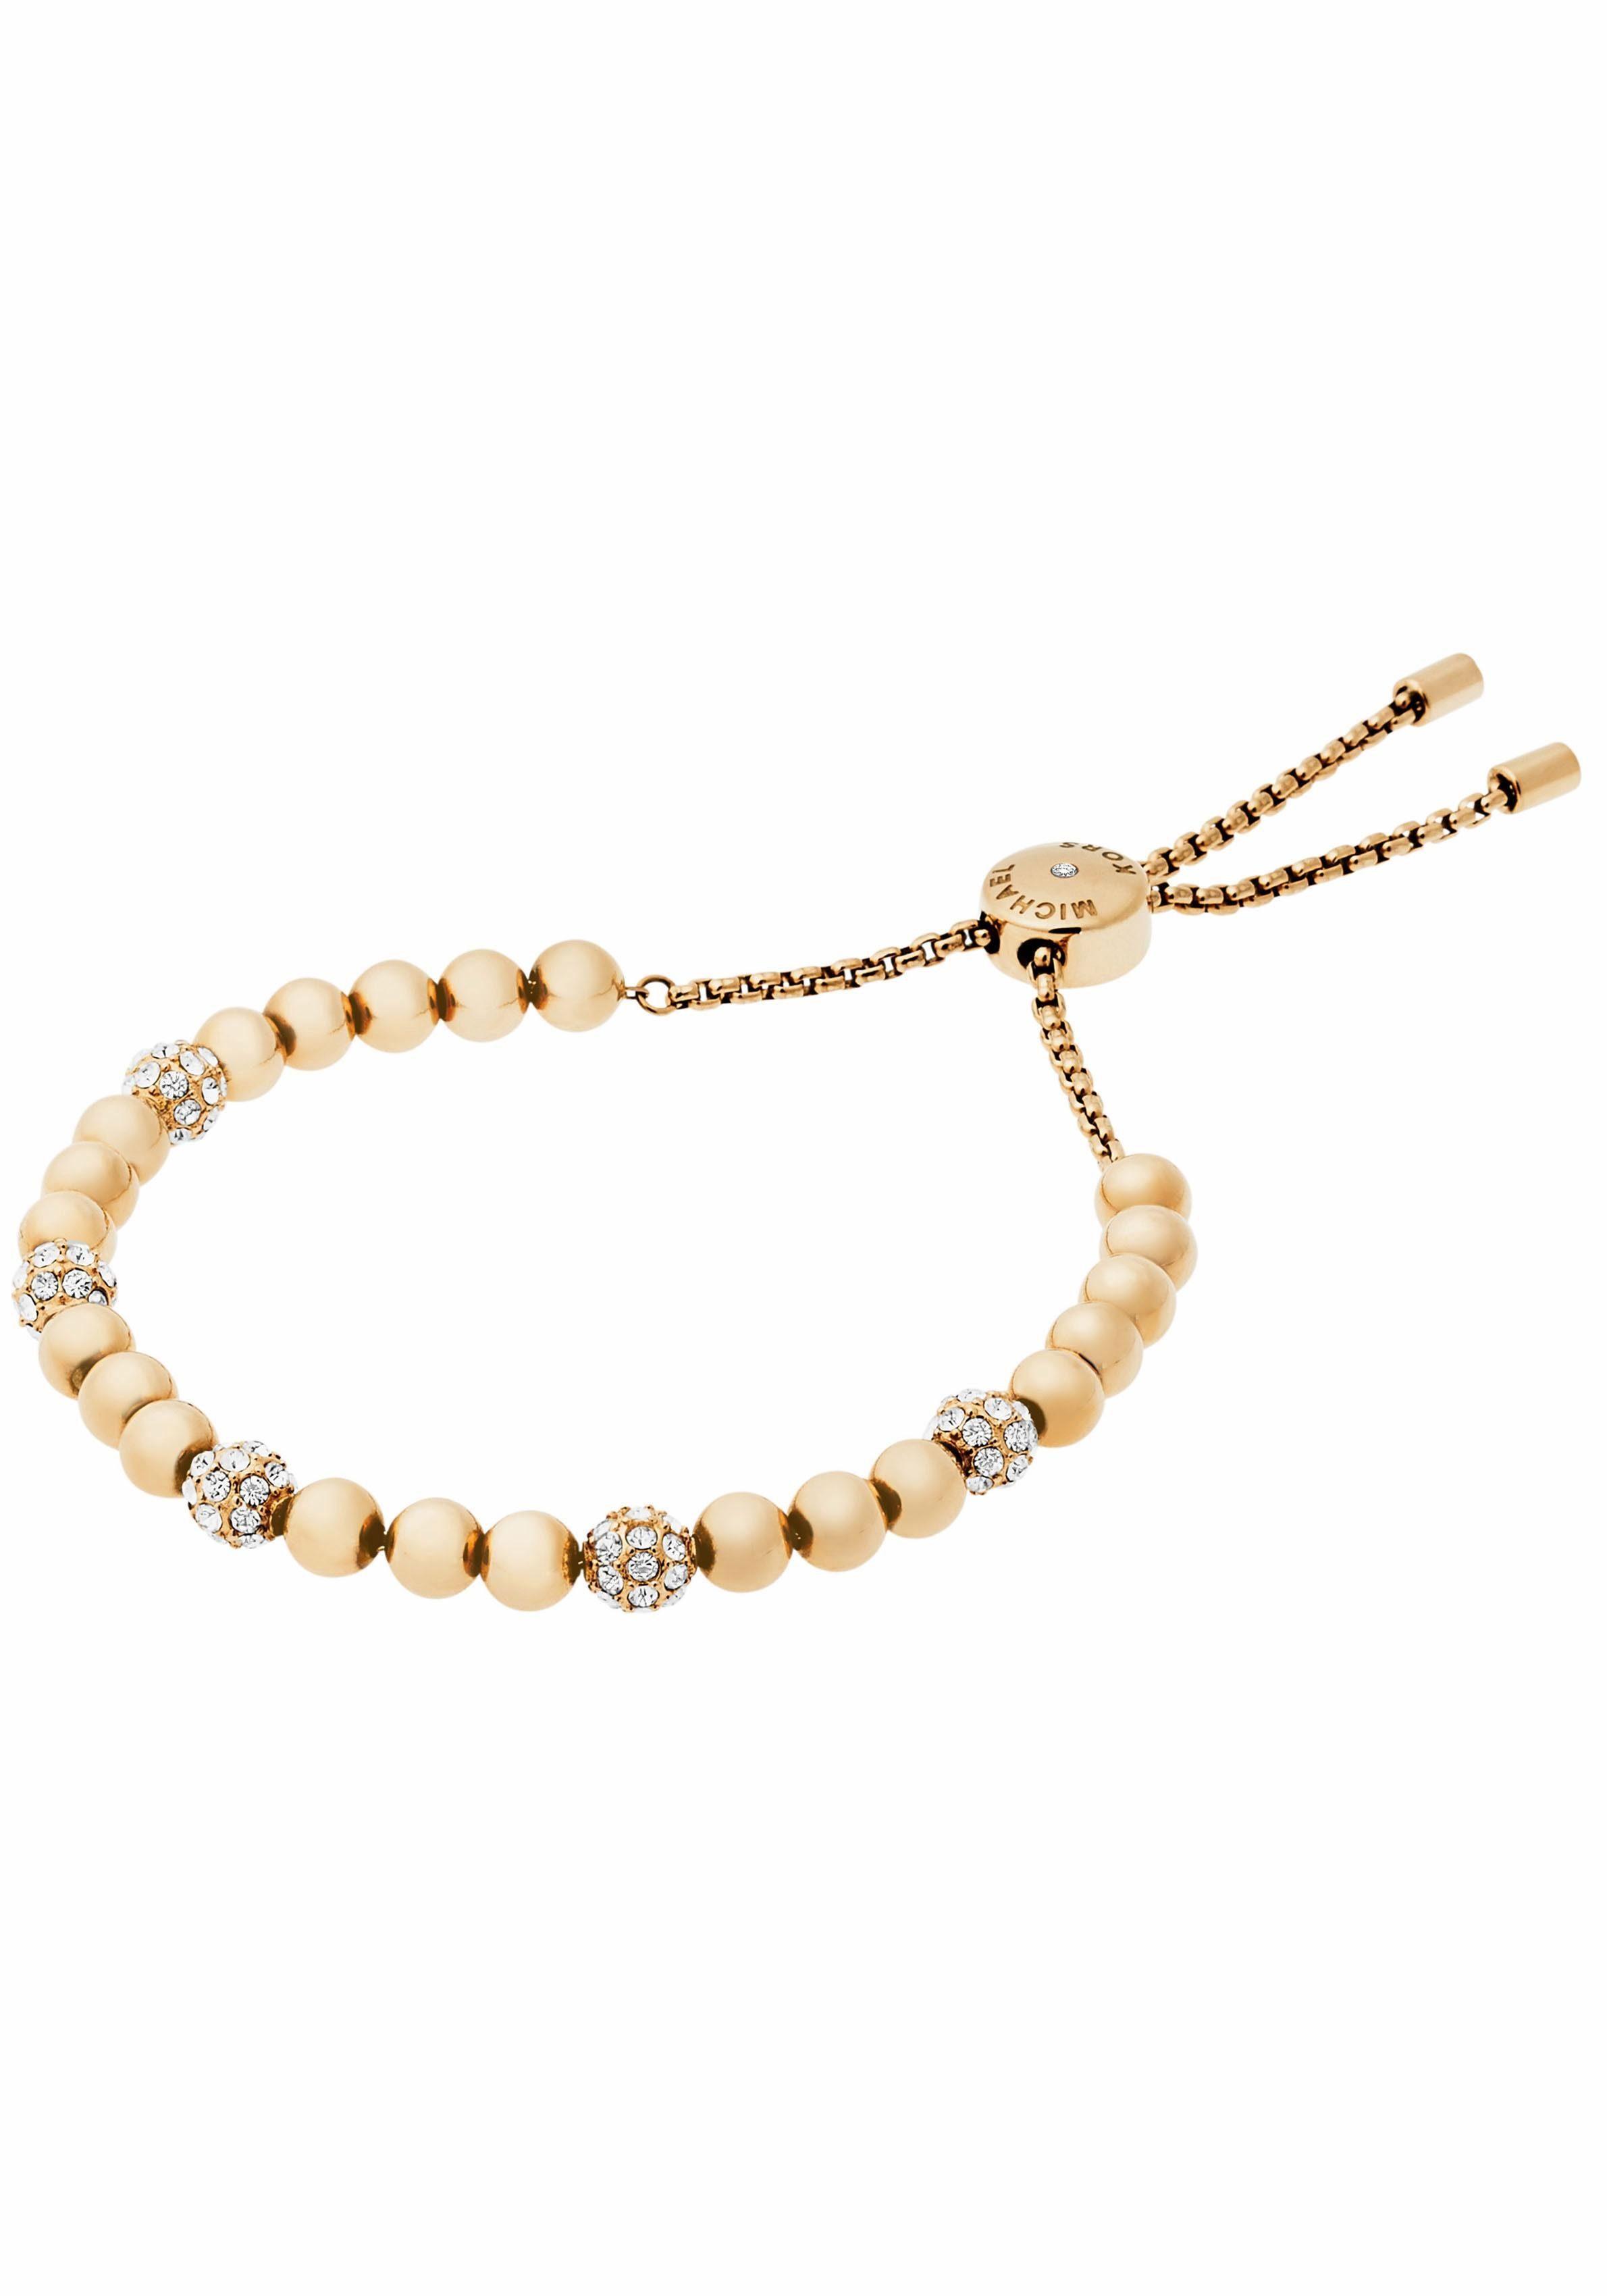 MICHAEL KORS Armband »MKJ5218710«, mit Glassteinen